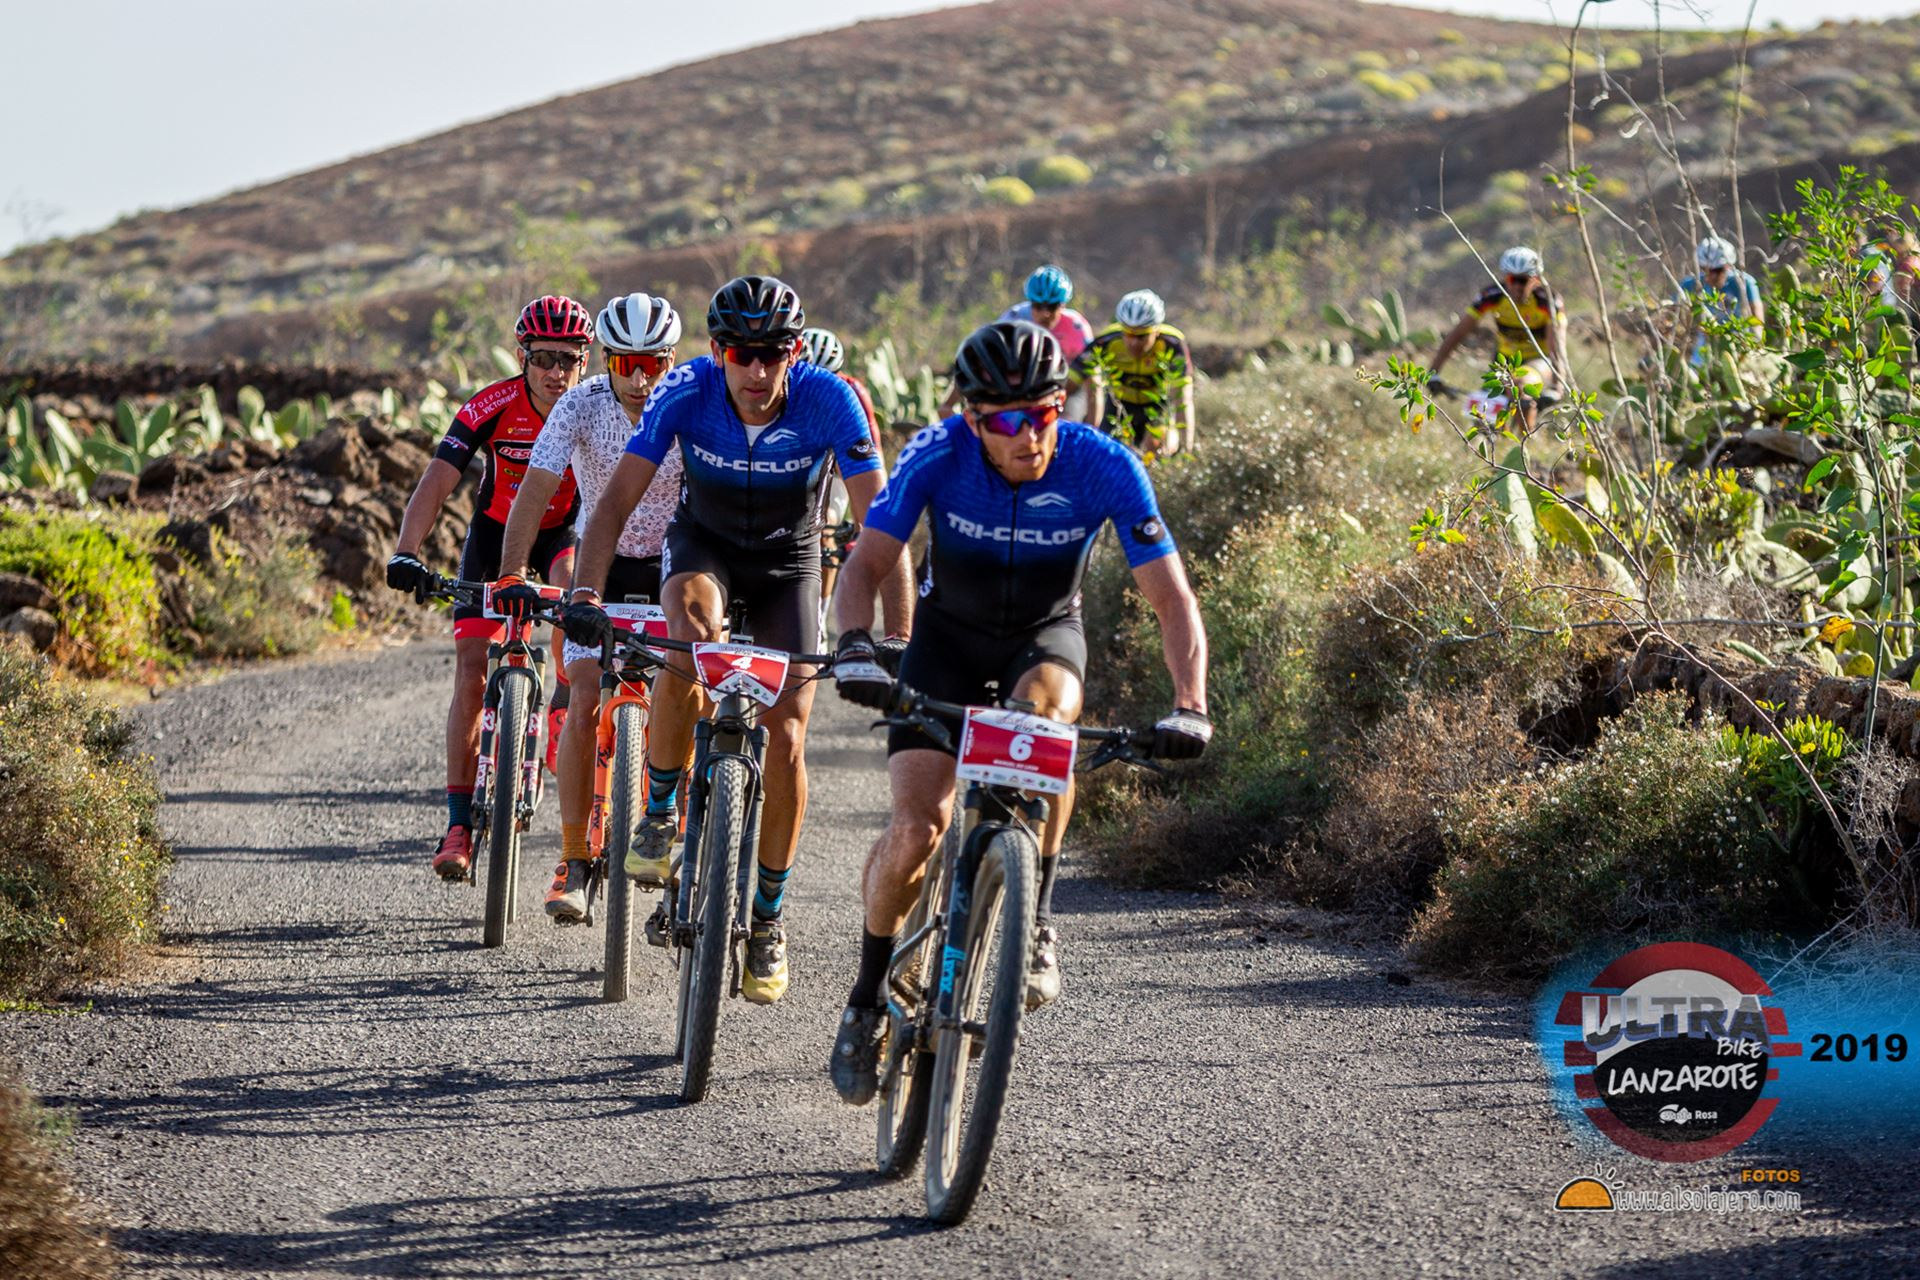 Sector Guatiza 2ª Etapa Ultrabike 2019 Fotos Alsolajero.com-2